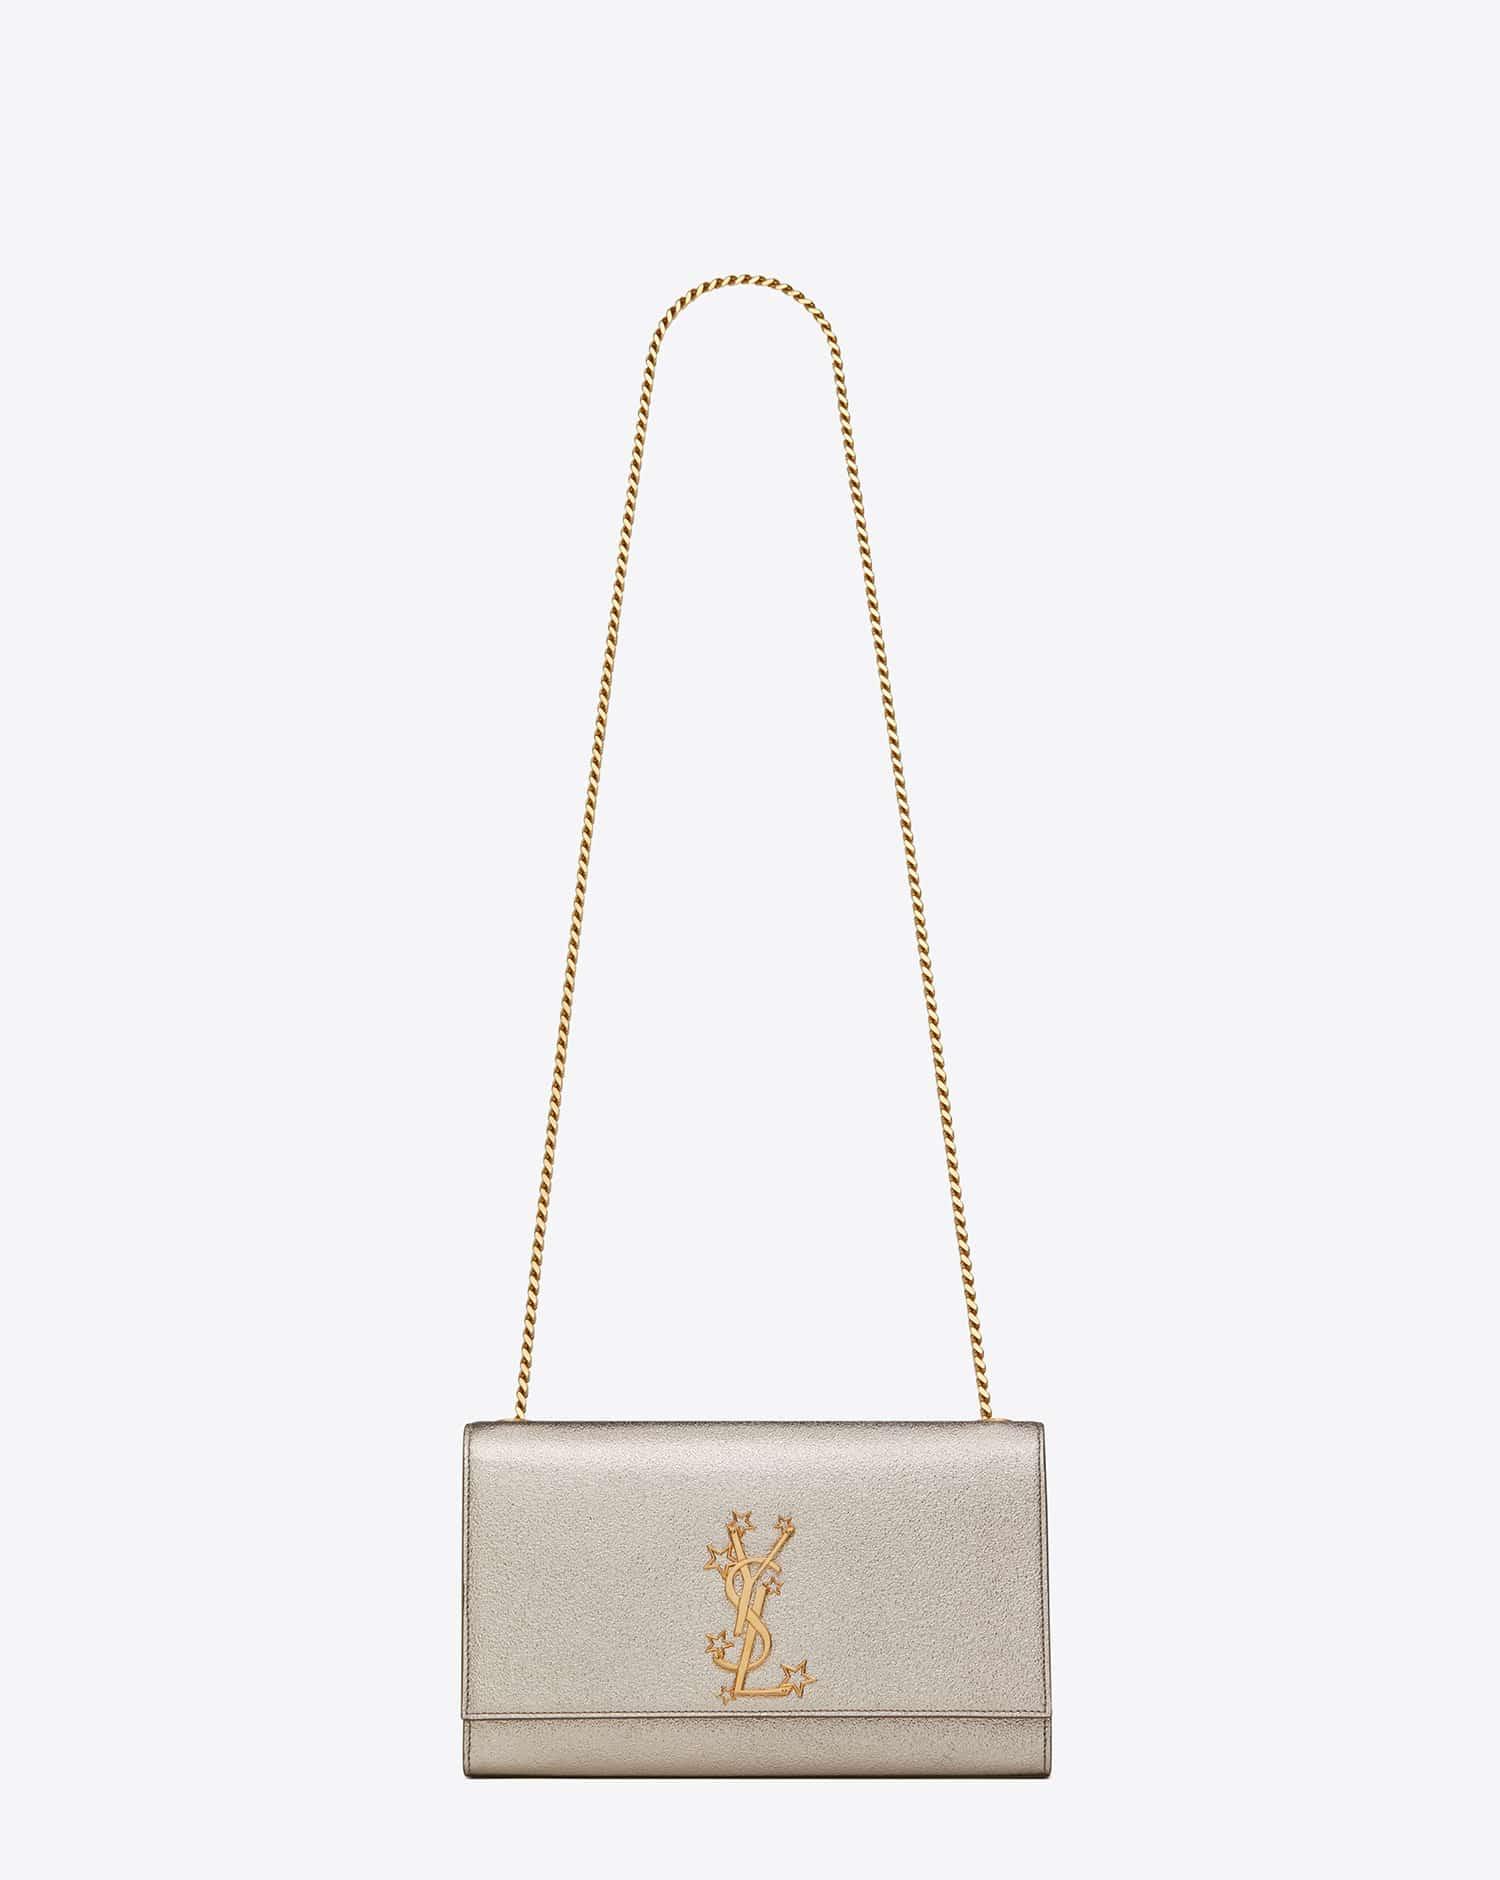 f8fdc4ffe1b9c Saint Laurent Pale Gold Star Studded Medium Monogram Kate Satchel Bag